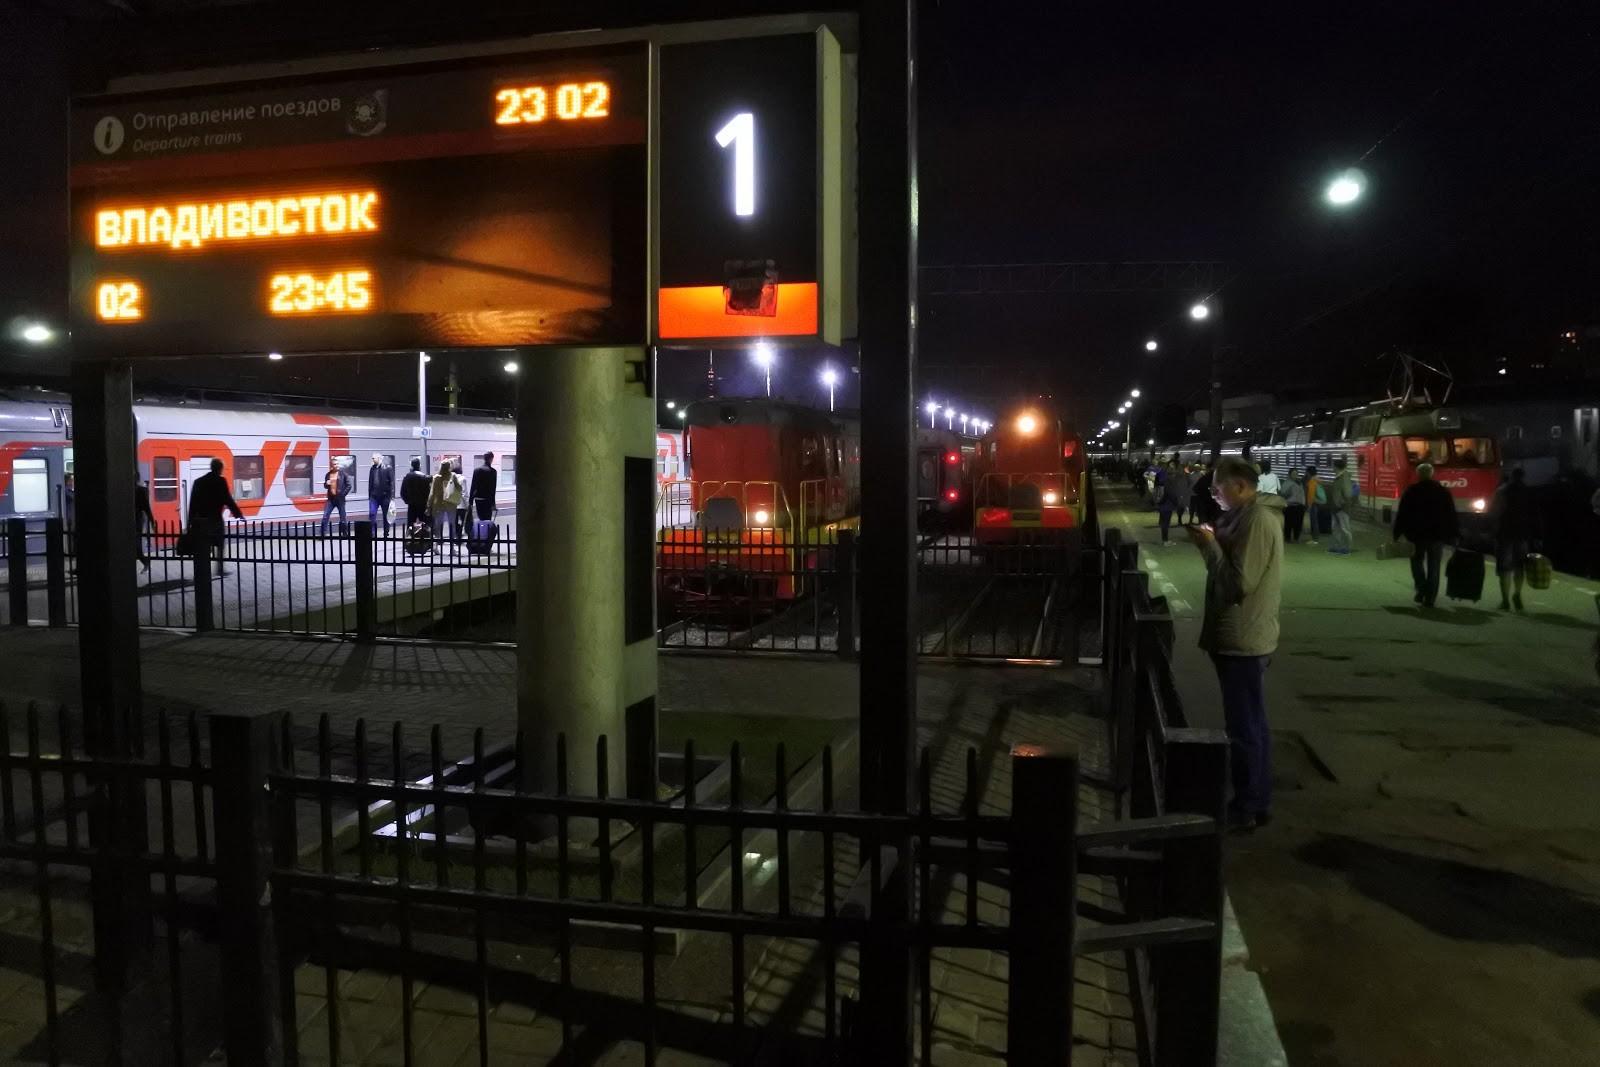 Čakanje na vlak proti Vladivostoku